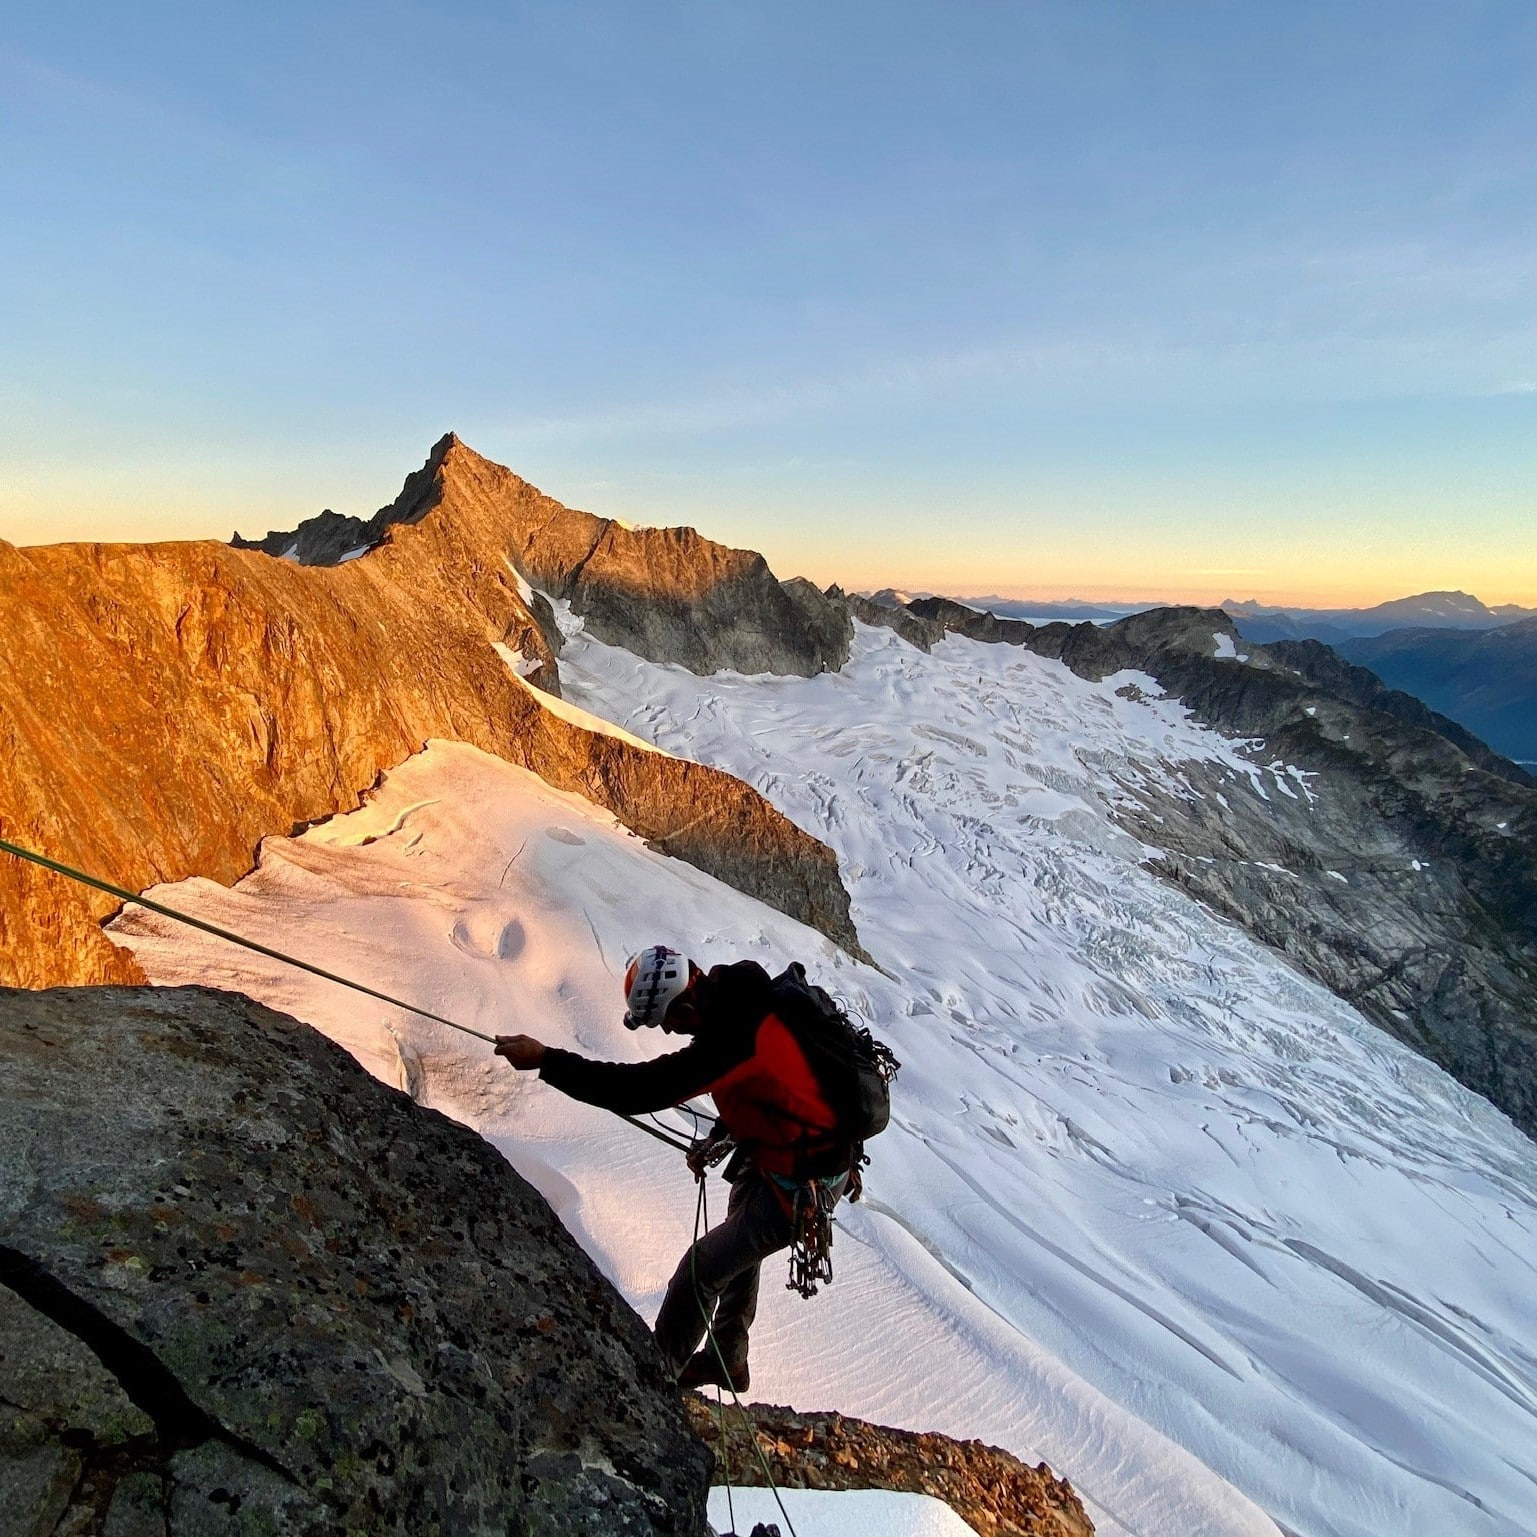 cascades 8 day intermediate mountaineering course